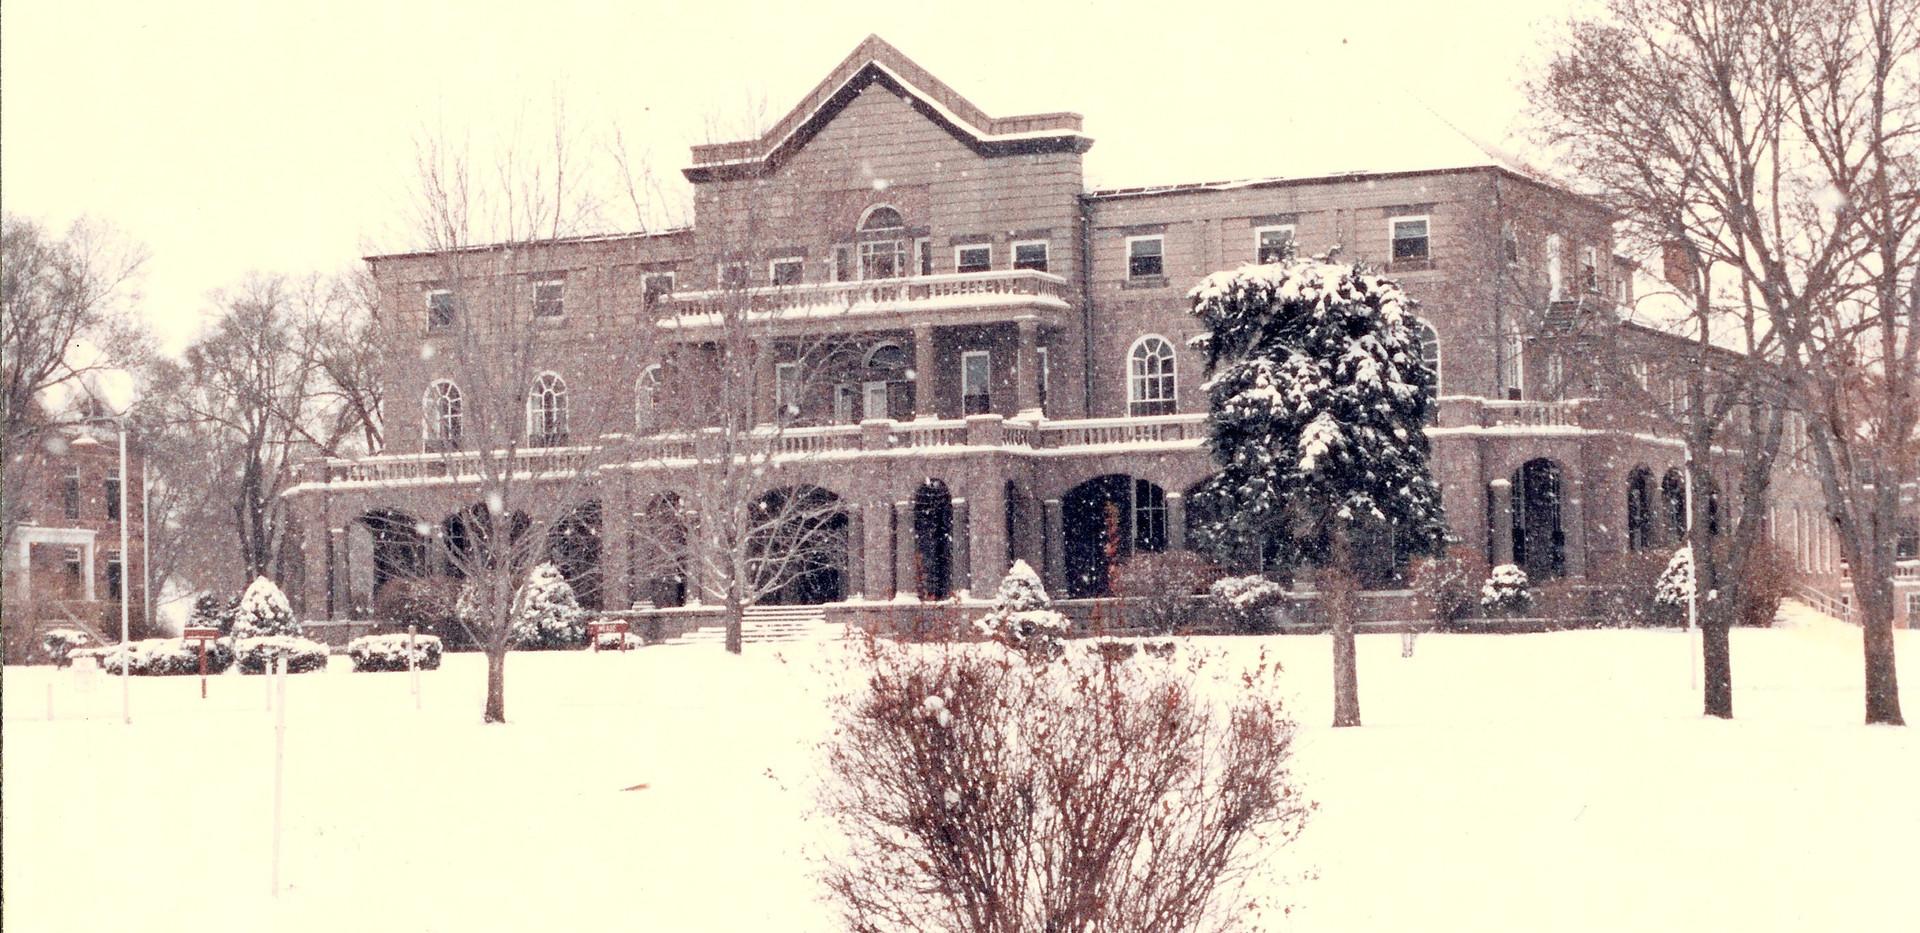 HSC Mead Building Exterior ca 1980.jpg